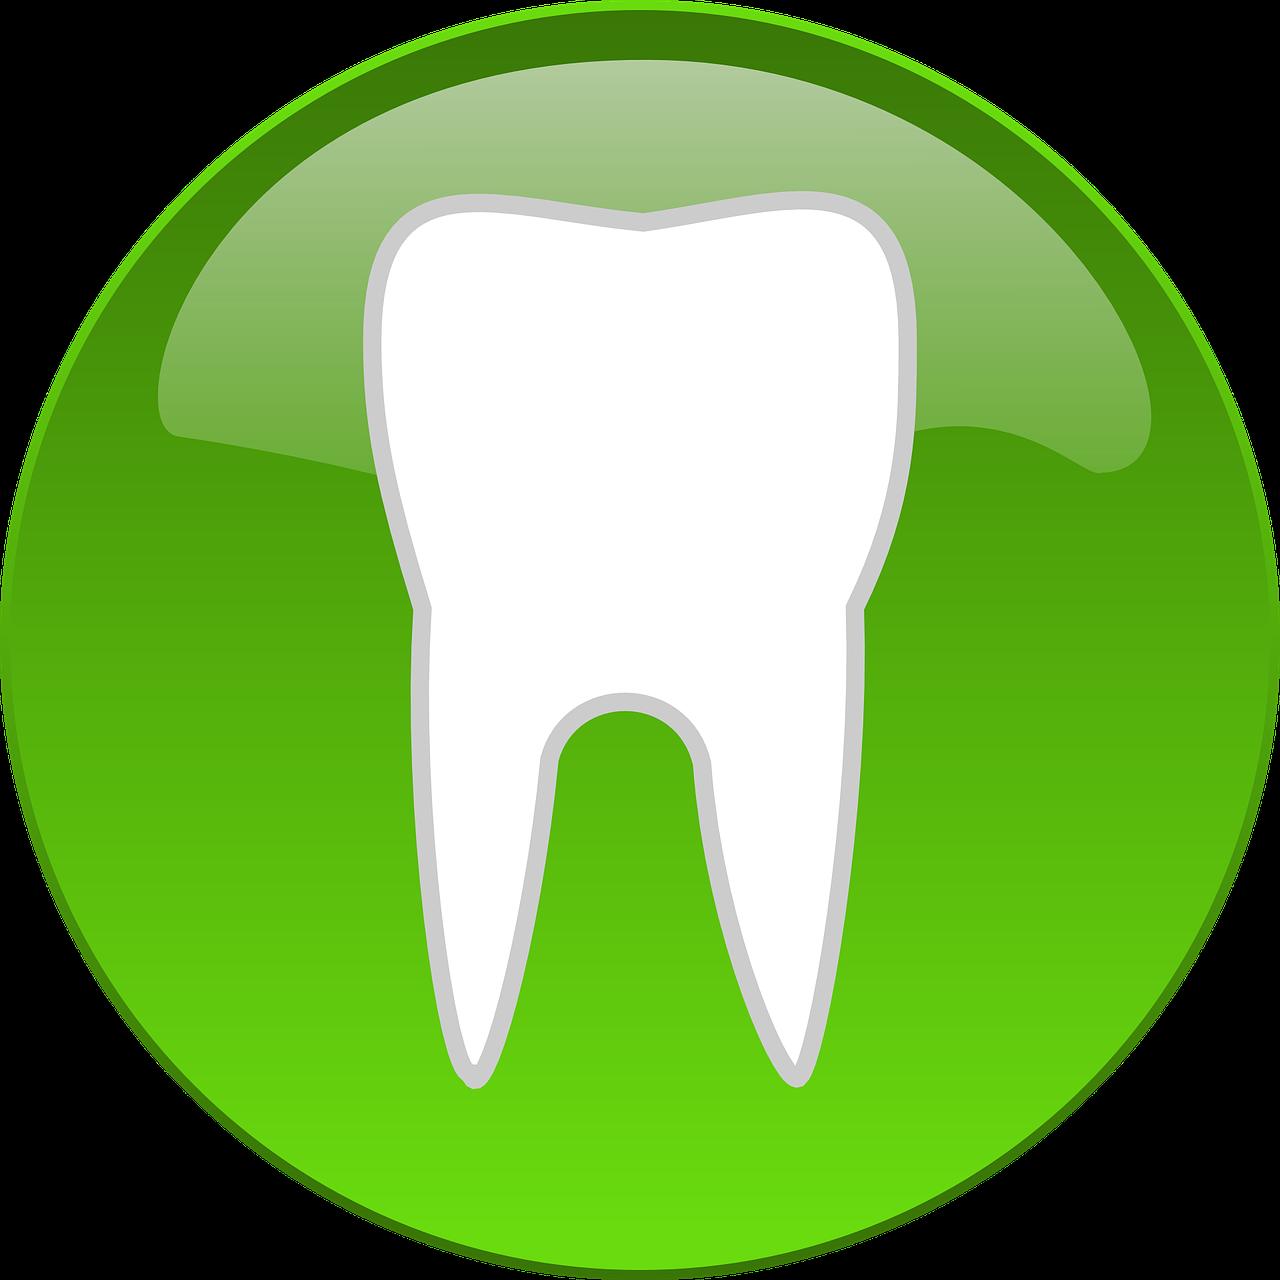 Dentist clipart light. The long term impacts